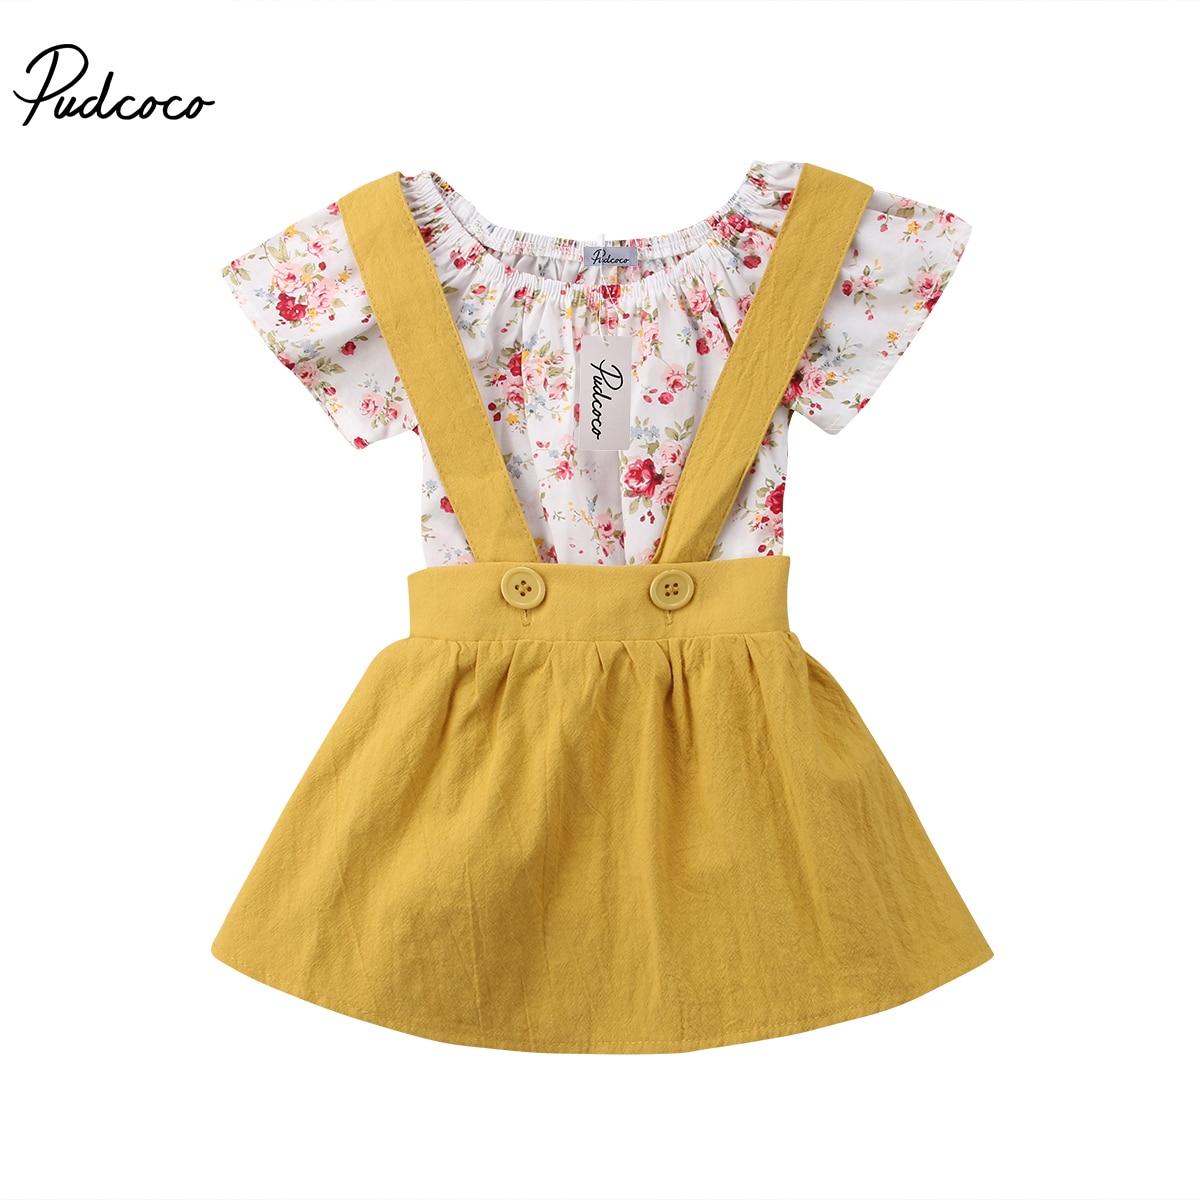 2PCS Baby Clothes Newborn Floral Rompers Kids Baby Girls Short Sleeve Tops Toddler Suspender Skirt Sundress 0-18M